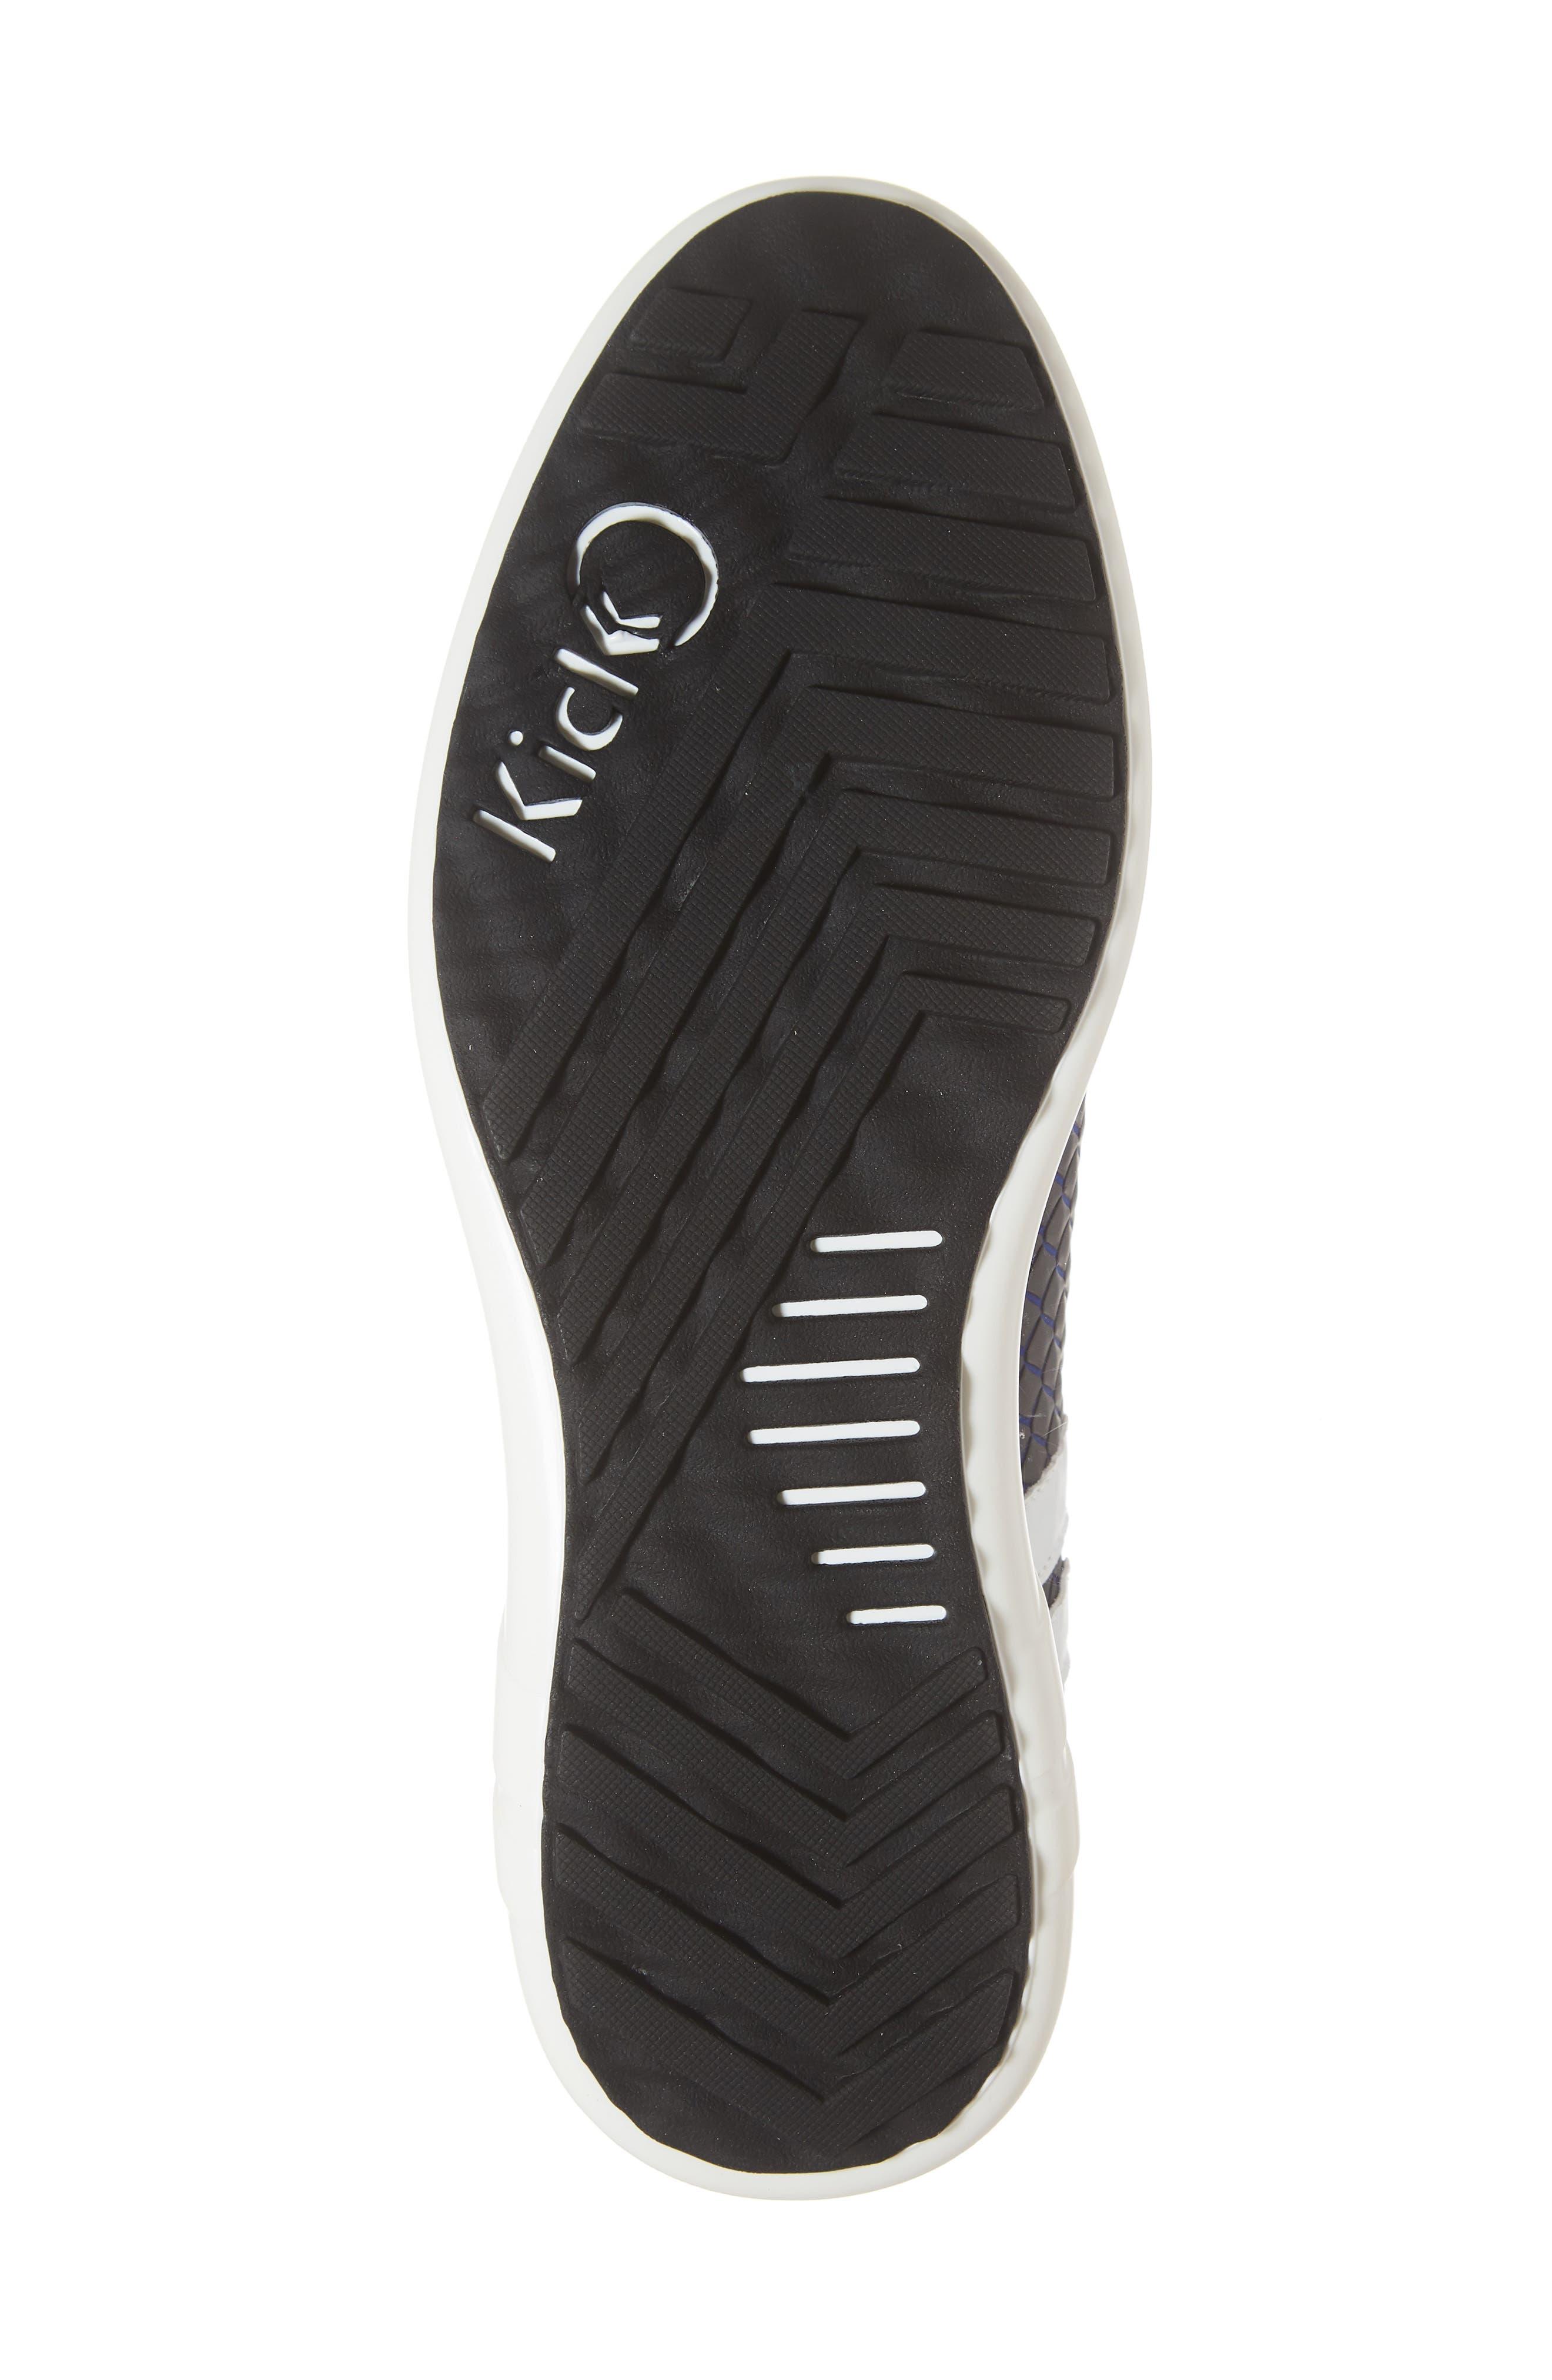 Onyx Sneaker,                             Alternate thumbnail 6, color,                             430